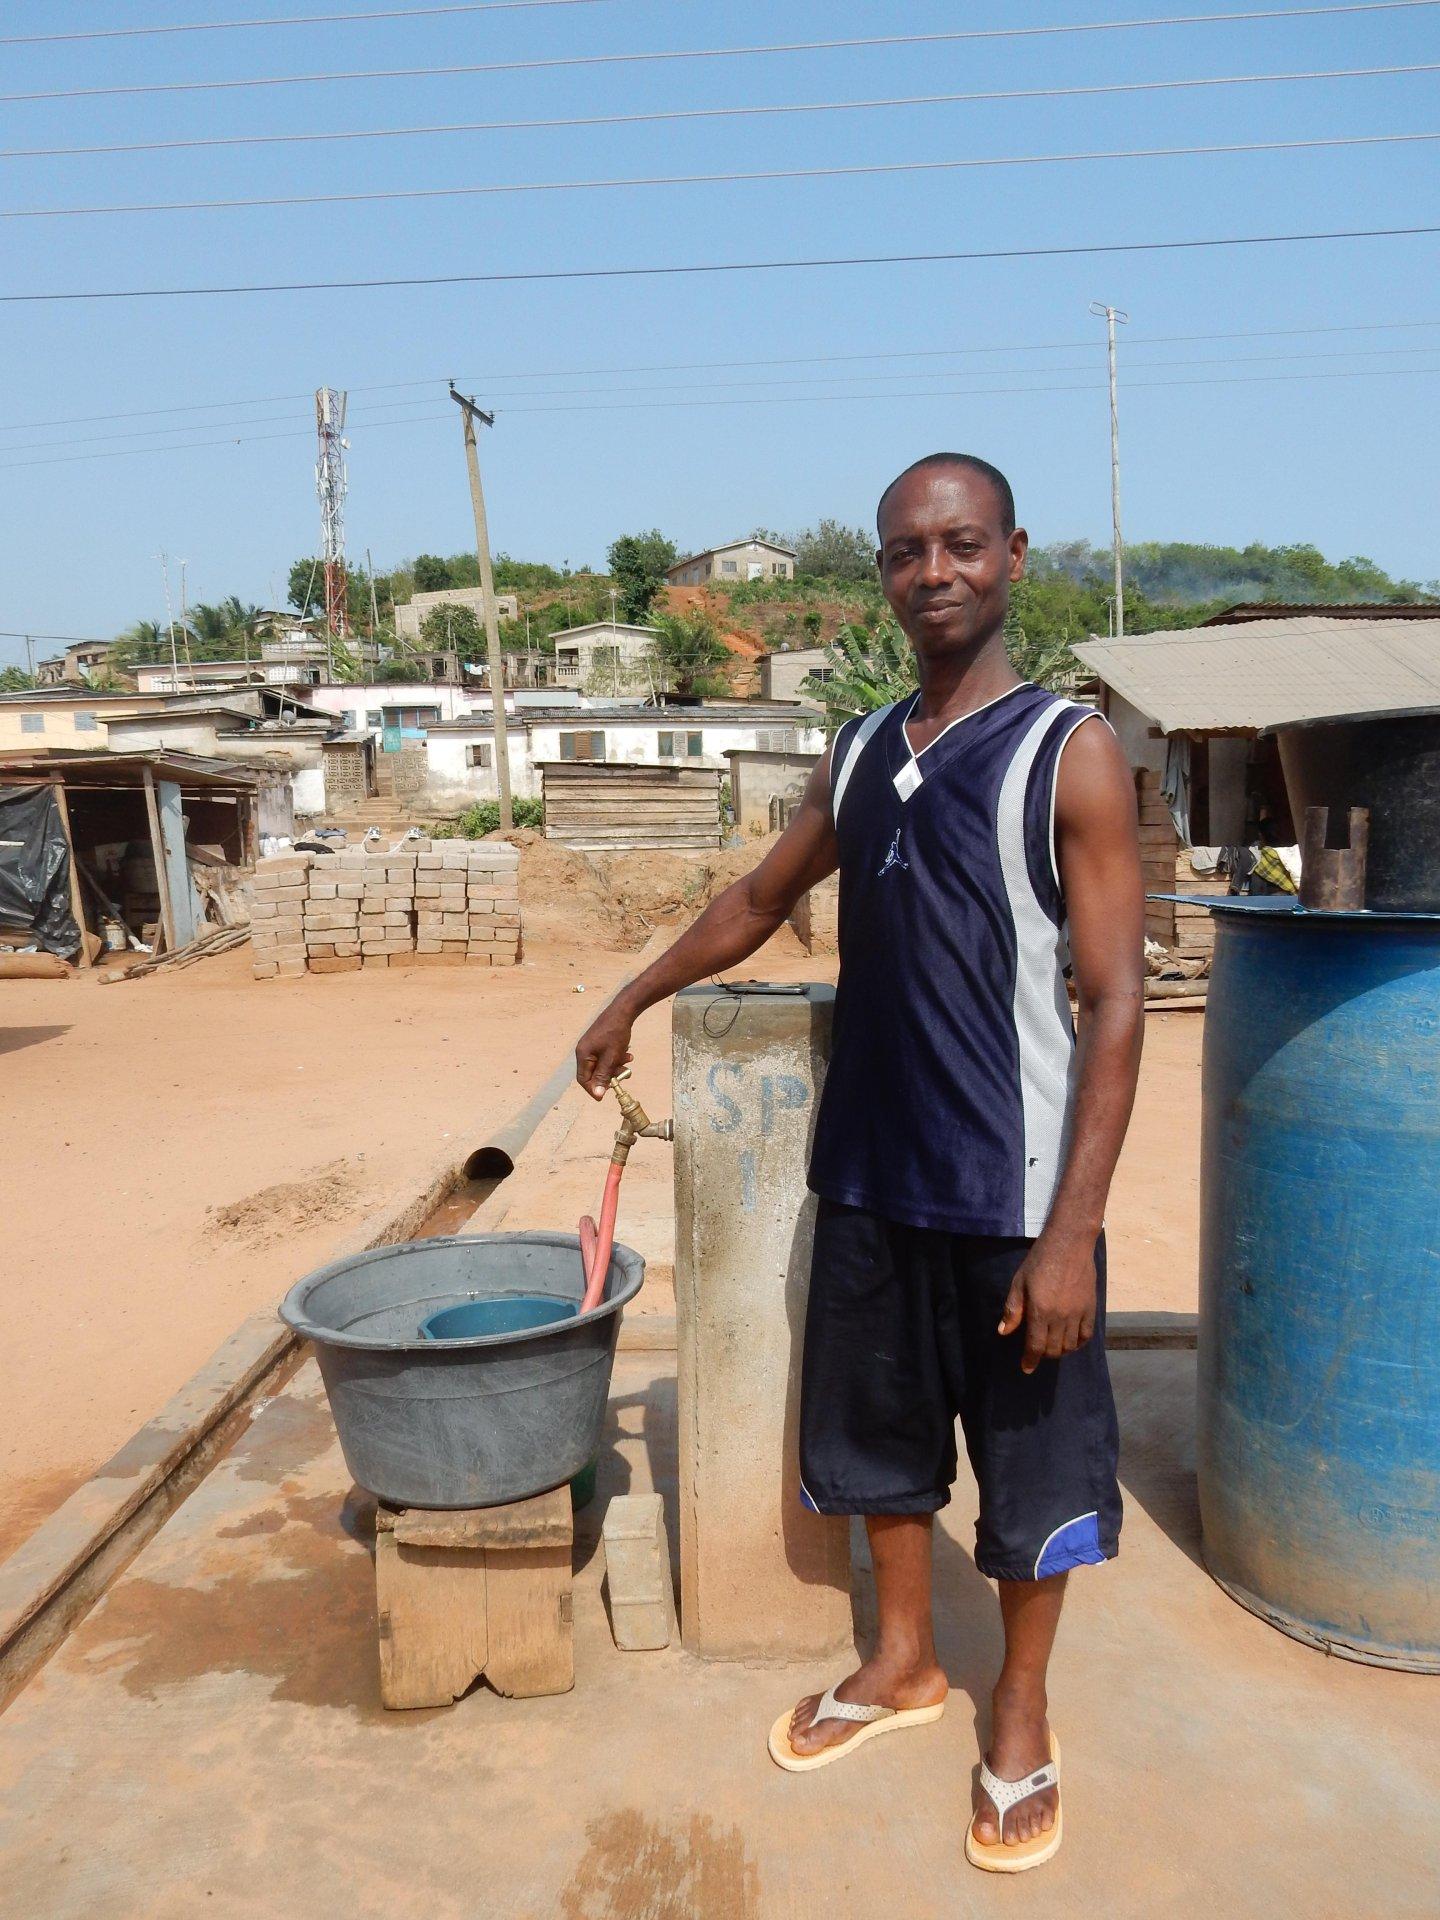 https://www.waterforlife.nl/files/visuals/_1920x1920_fit_center-center_85_none/Waterverkoper-Ghana.JPG